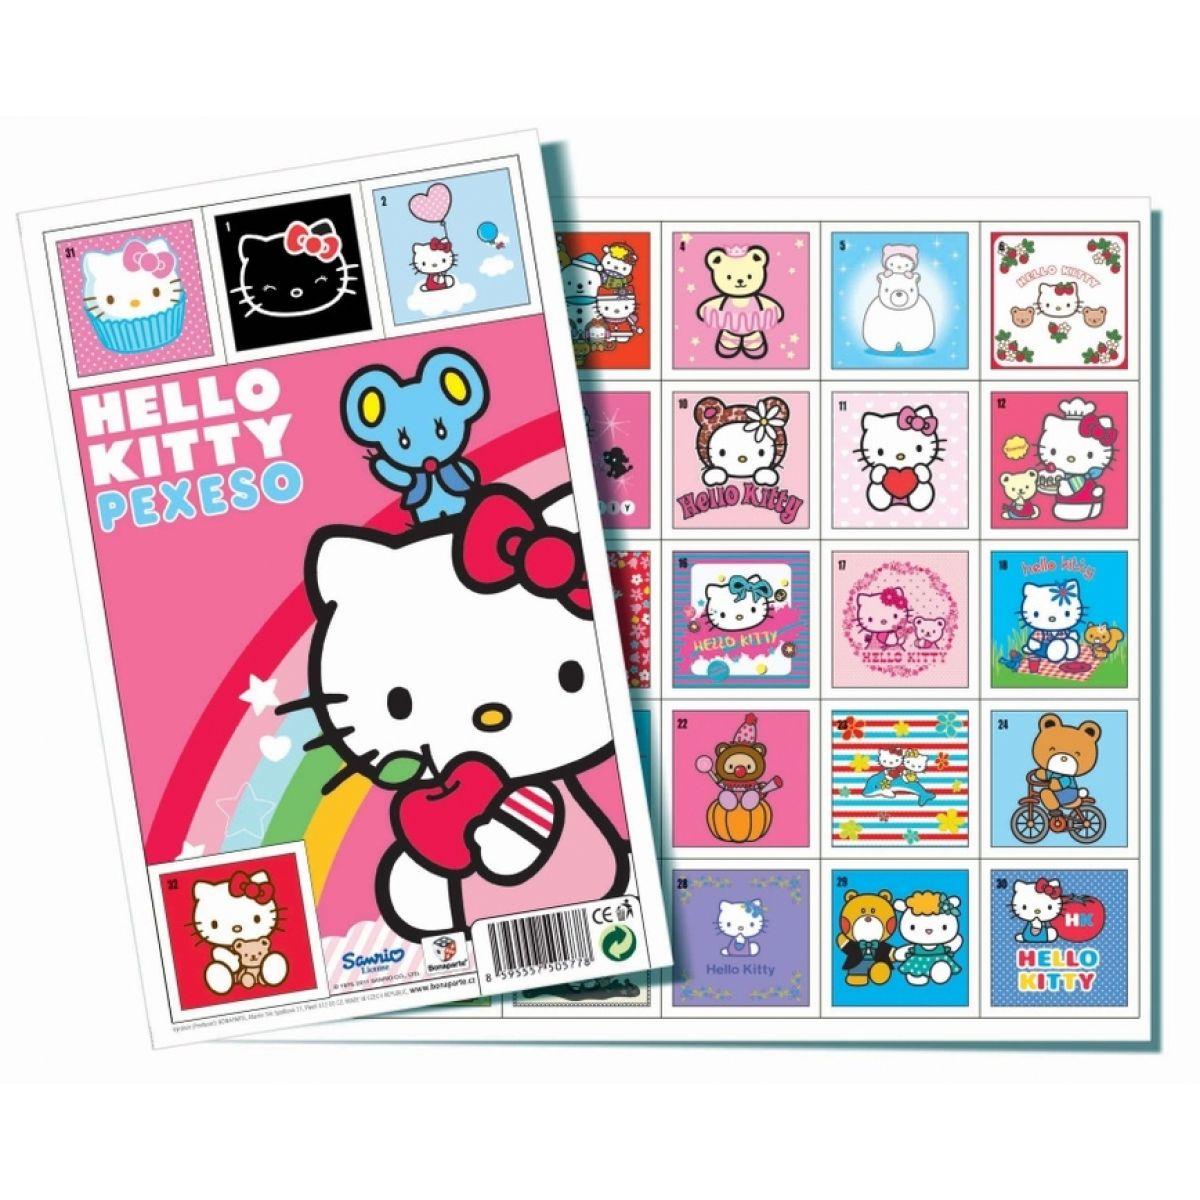 BONAPARTE 05778 - Pexeso Hello Kitty